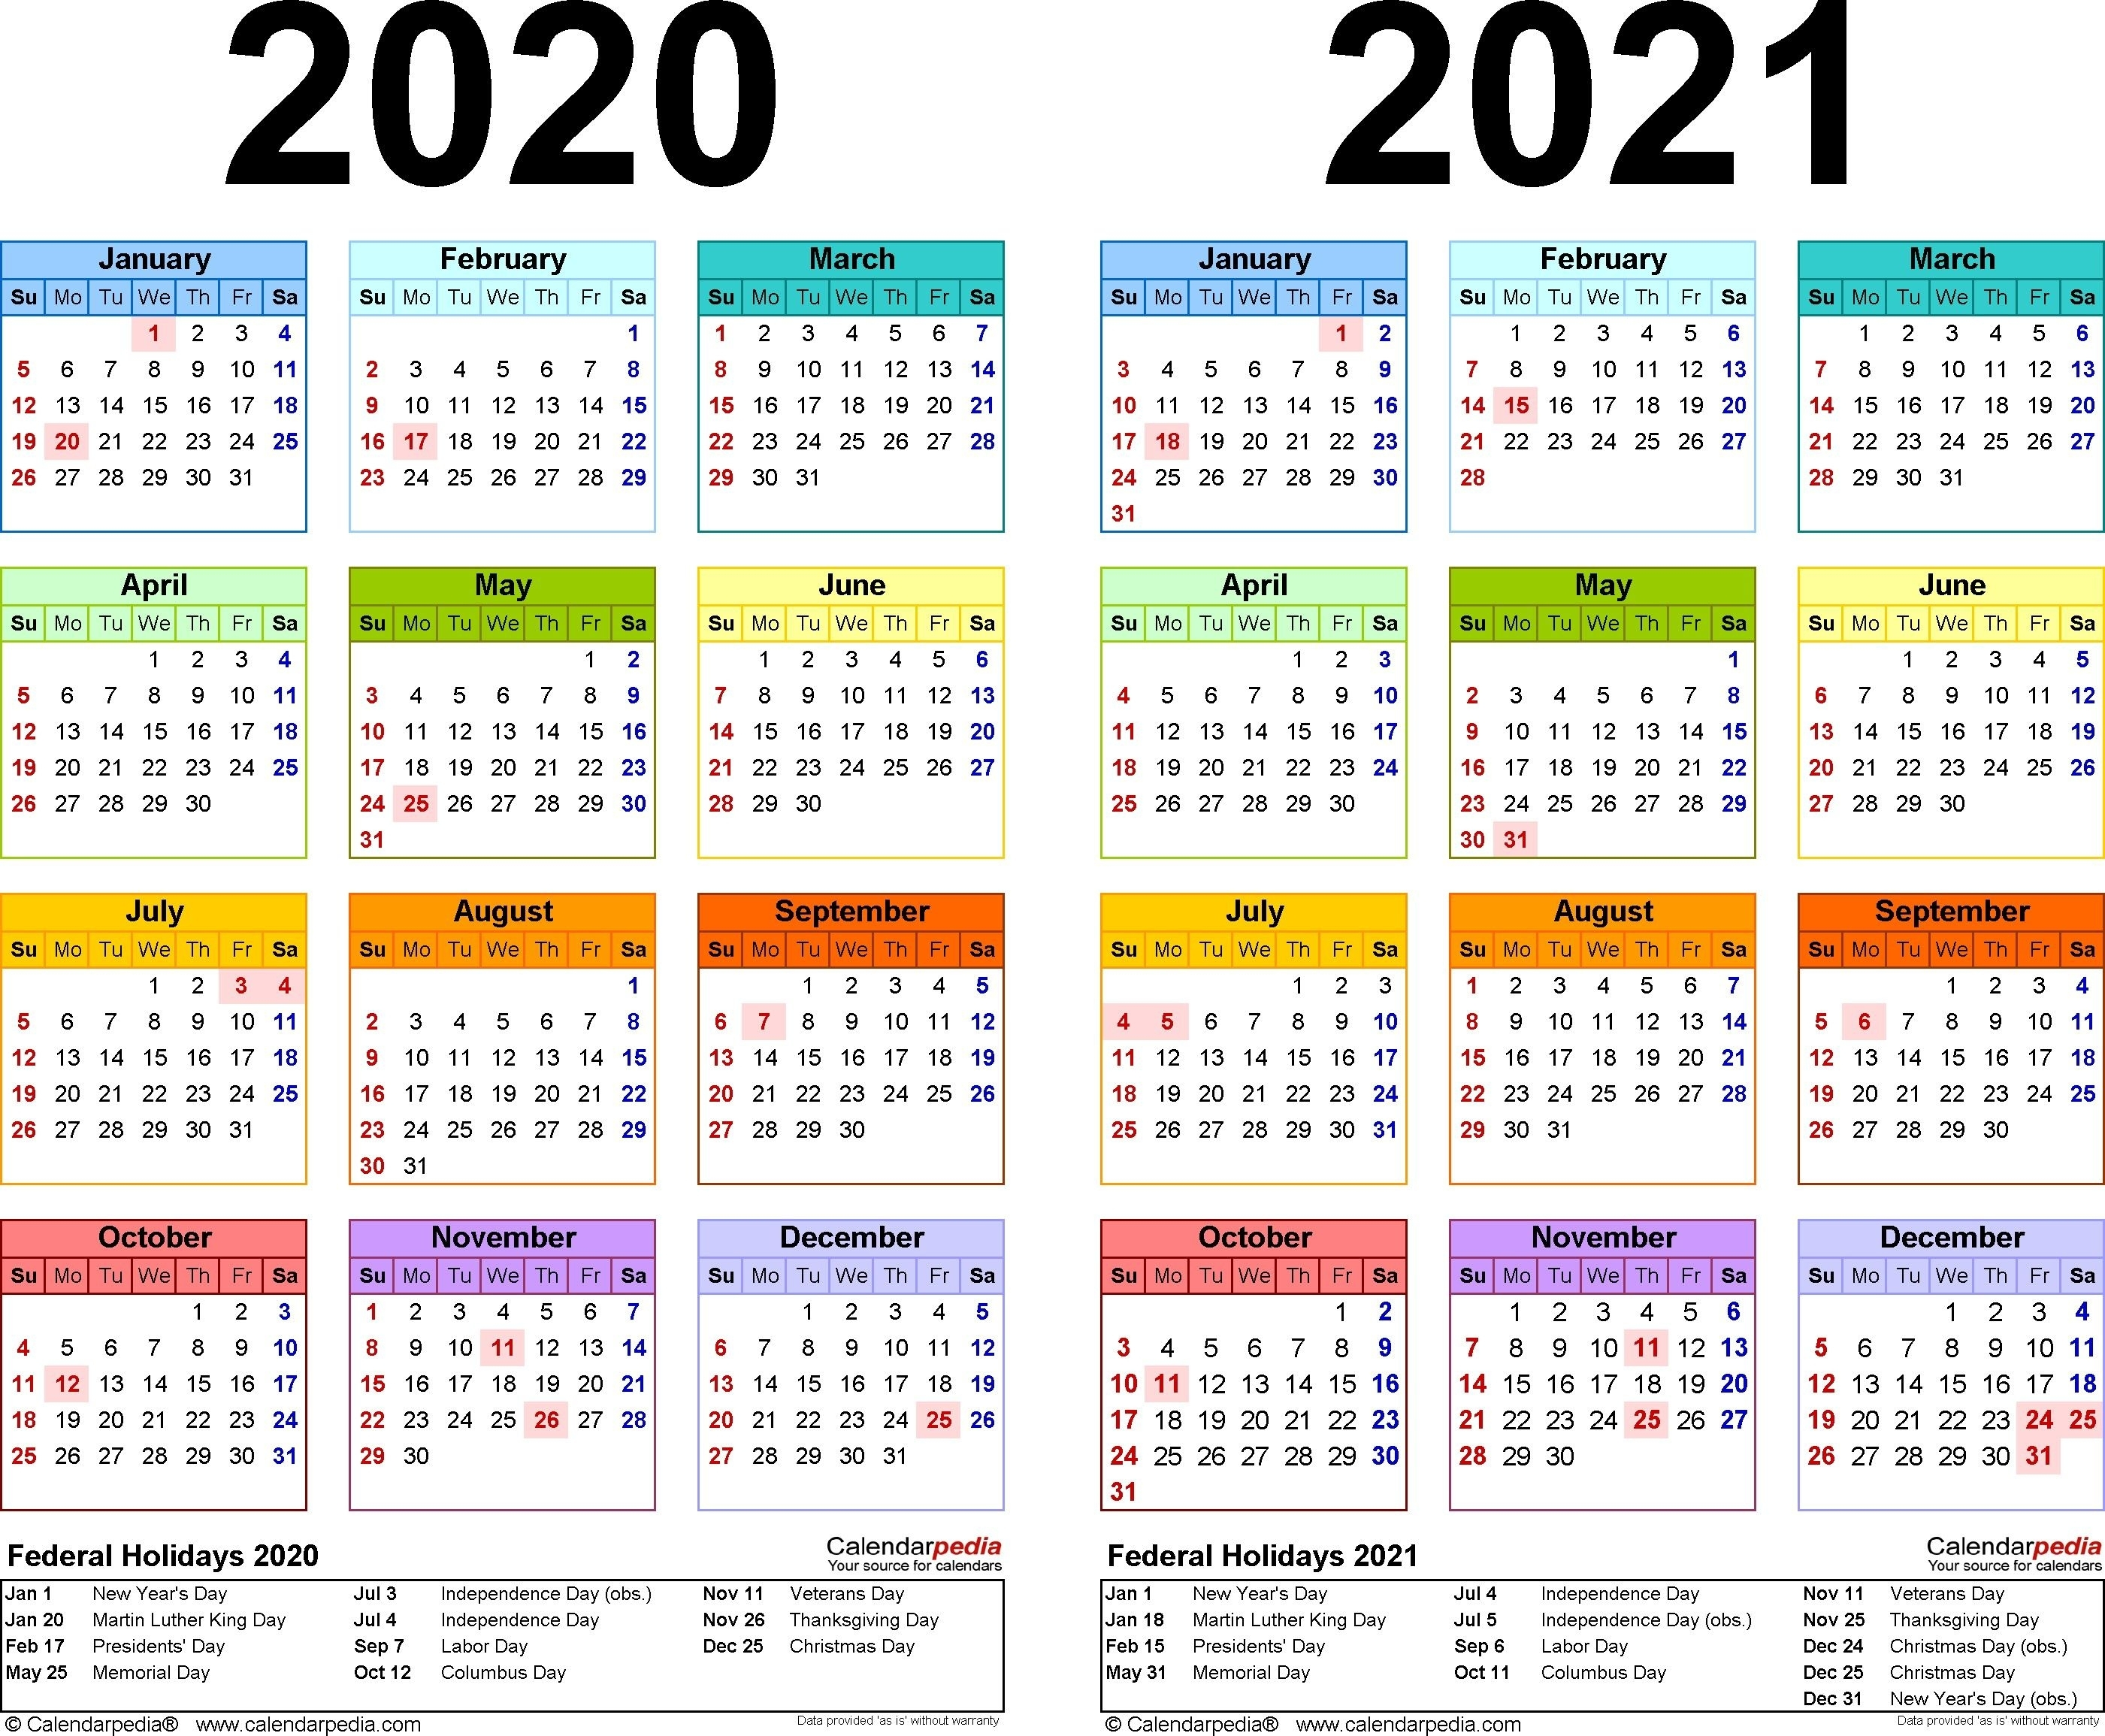 2020-21 Calendar Printable In 2020 | Printable Calendar pertaining to U Of T 2020-2021 Academic Calendar